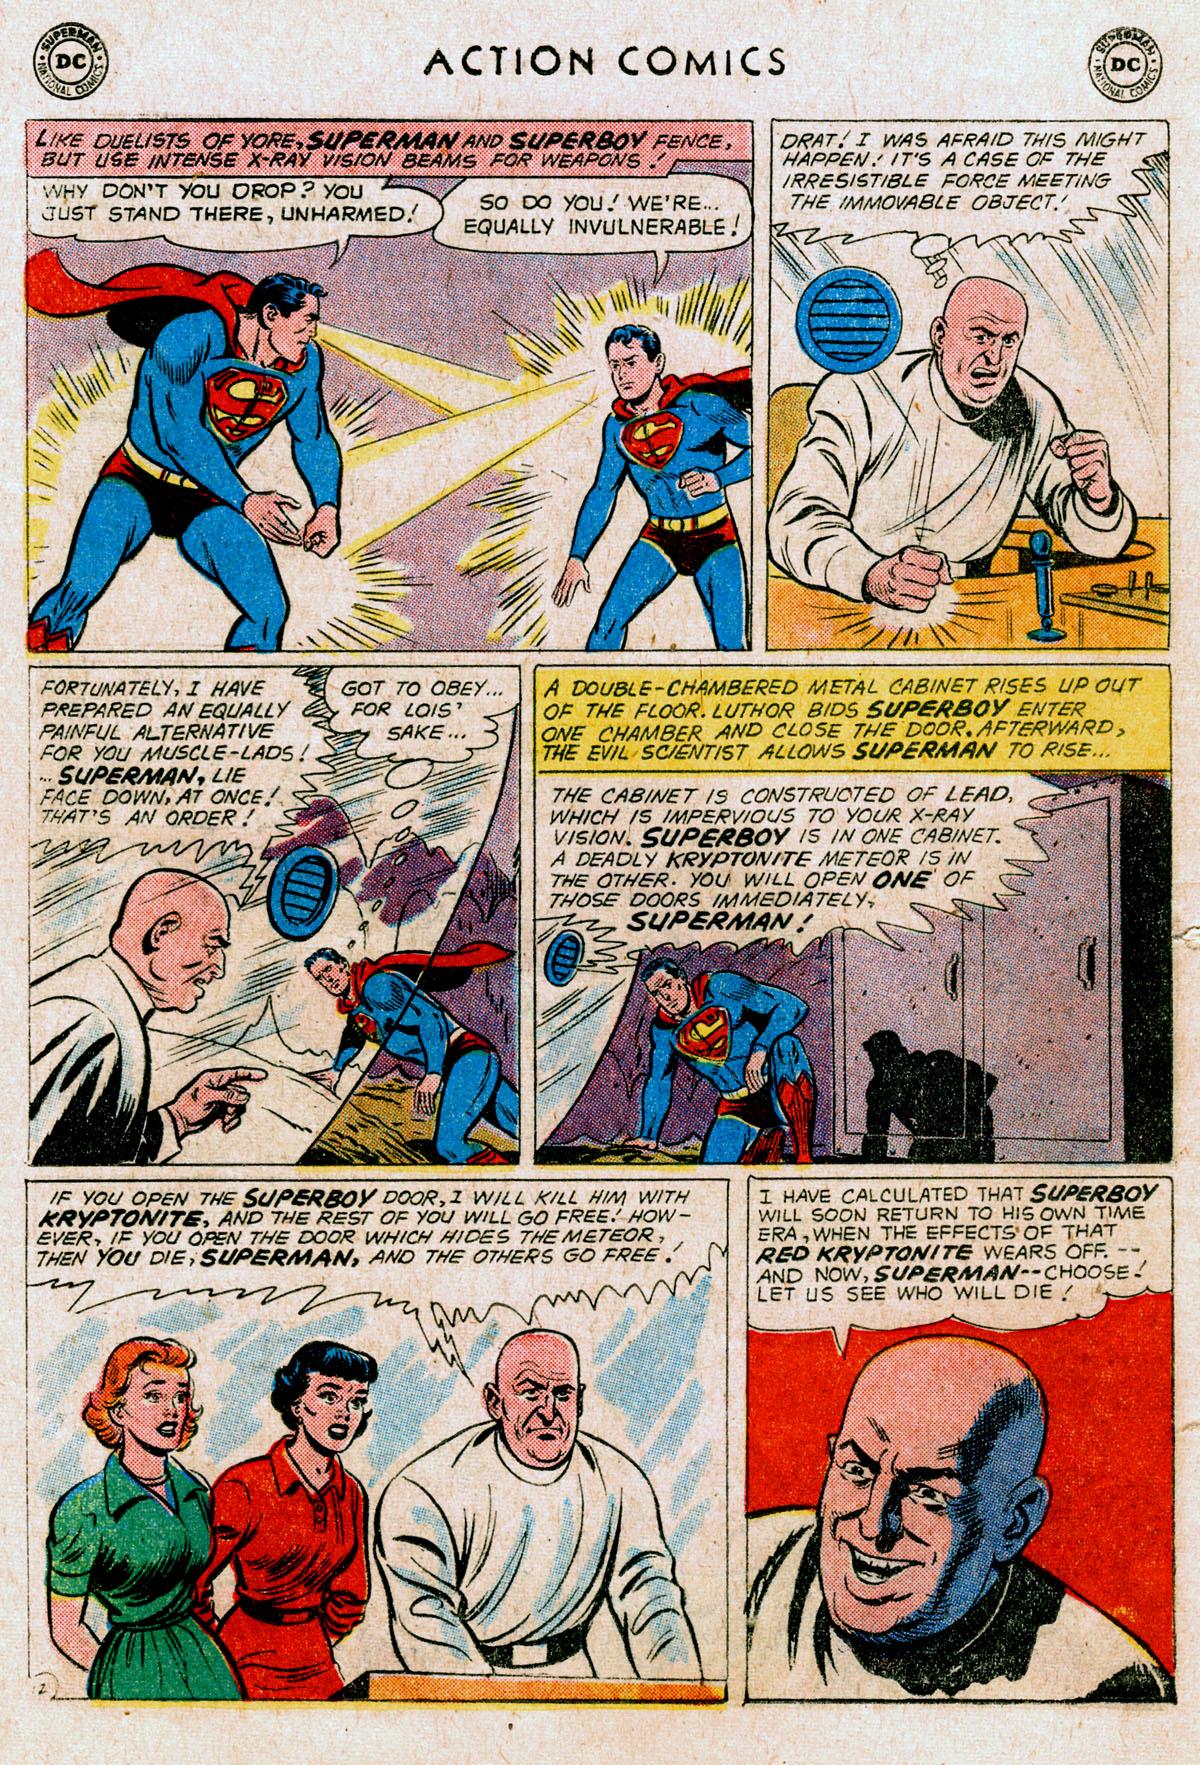 Action Comics (1938) 259 Page 13